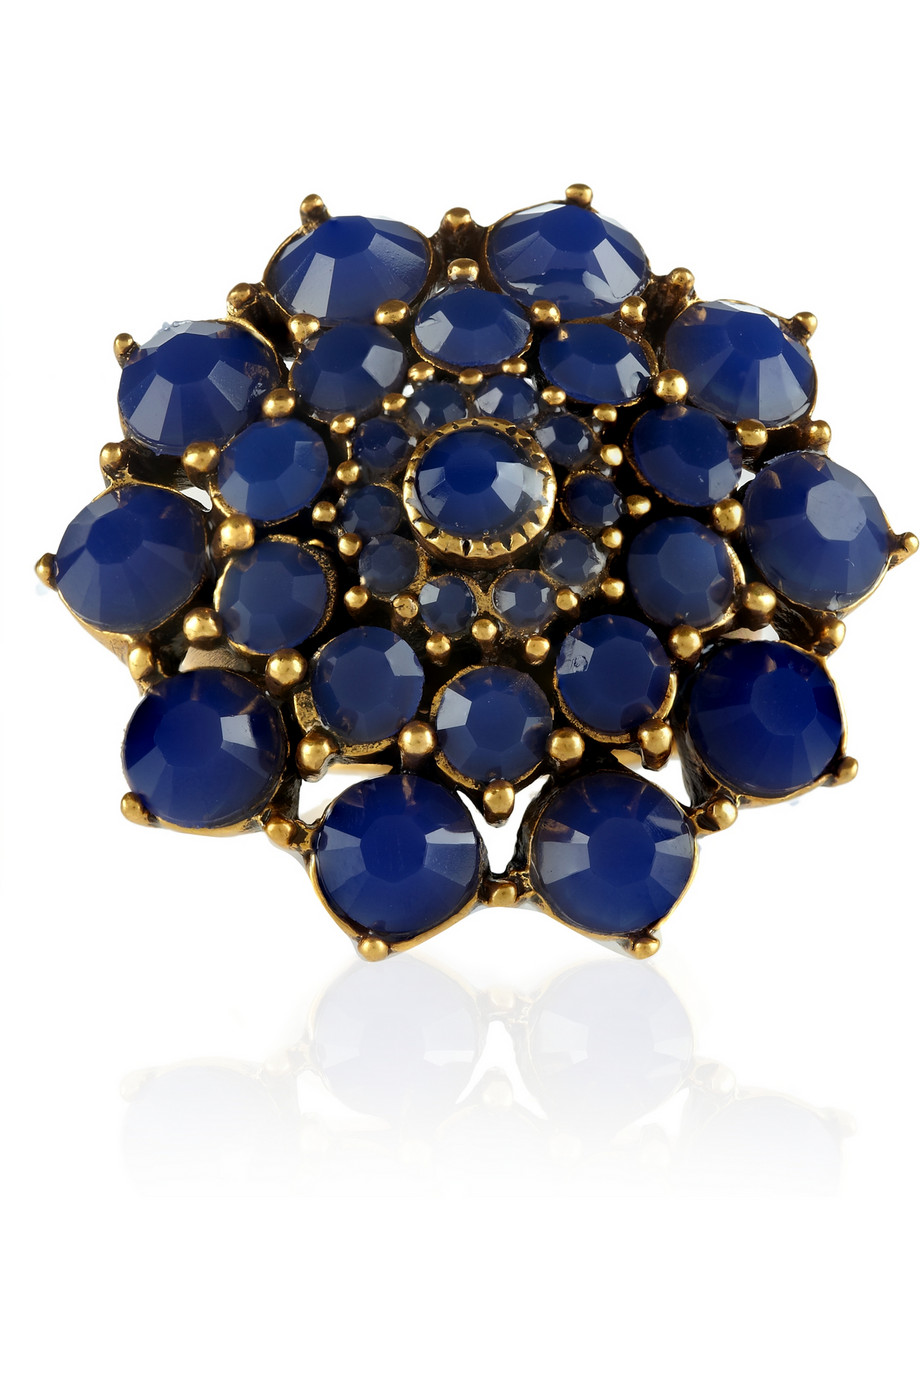 Oscar de la Renta Rose Goldtone Cabochon Ring in Blue (White)